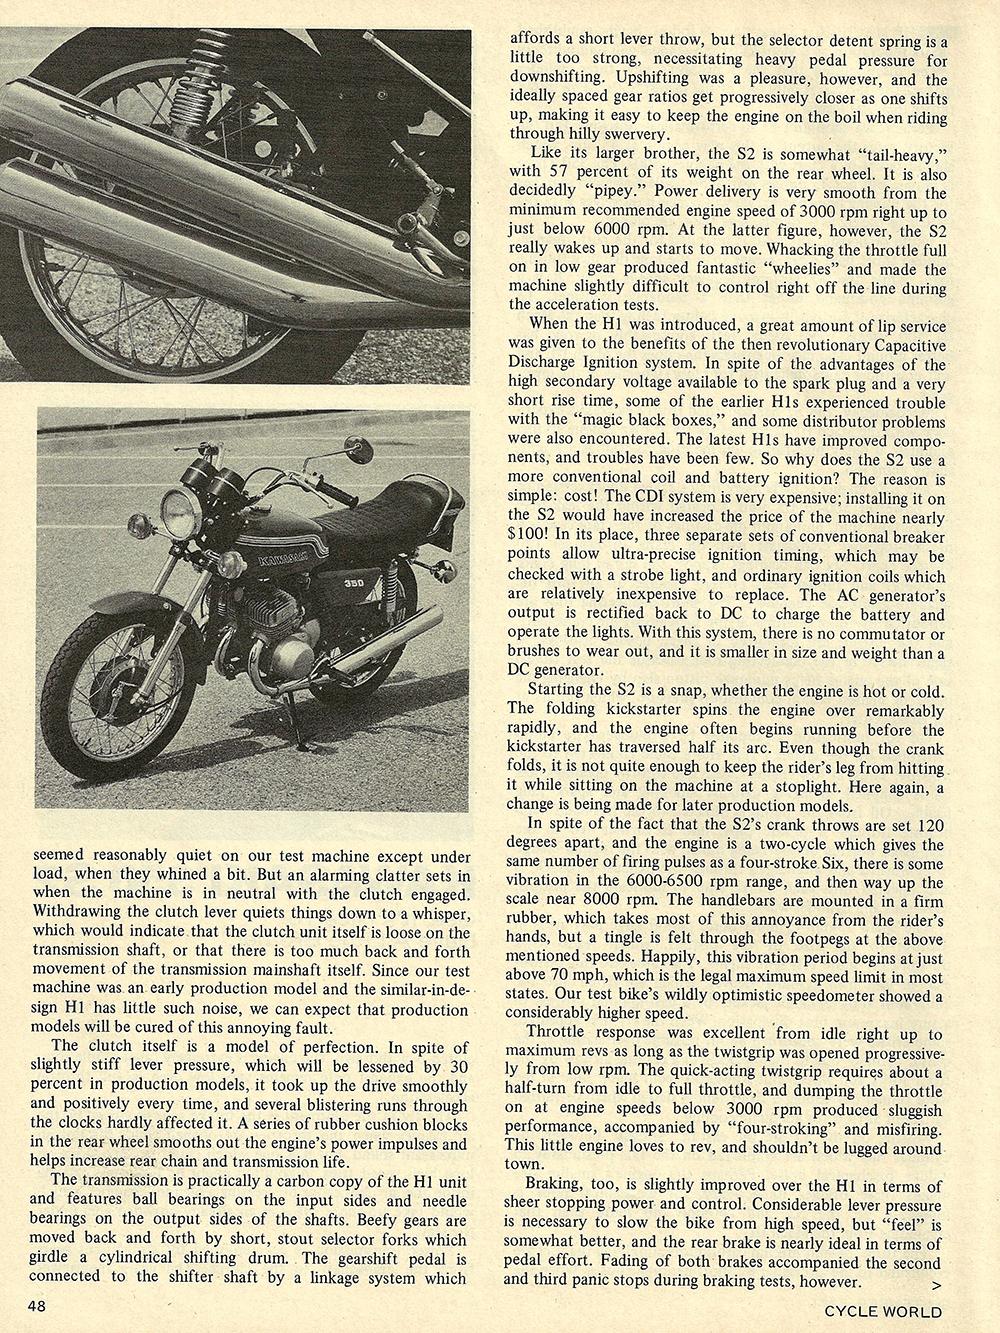 1971 Kawasaki 350 S2 road test 03.jpg